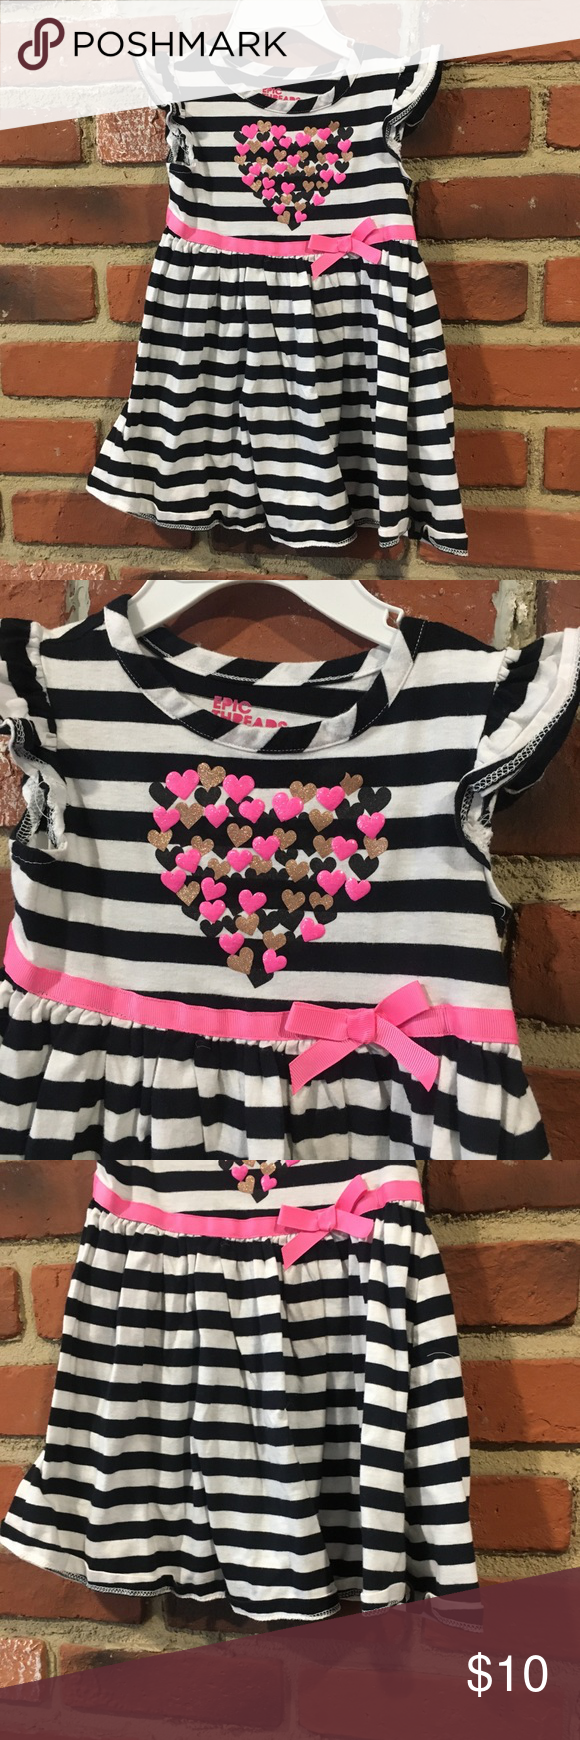 5 For 25 Baby Girl Dress Sz 2t Baby Girl Dress Girls Dresses Clothes Design [ 1740 x 580 Pixel ]